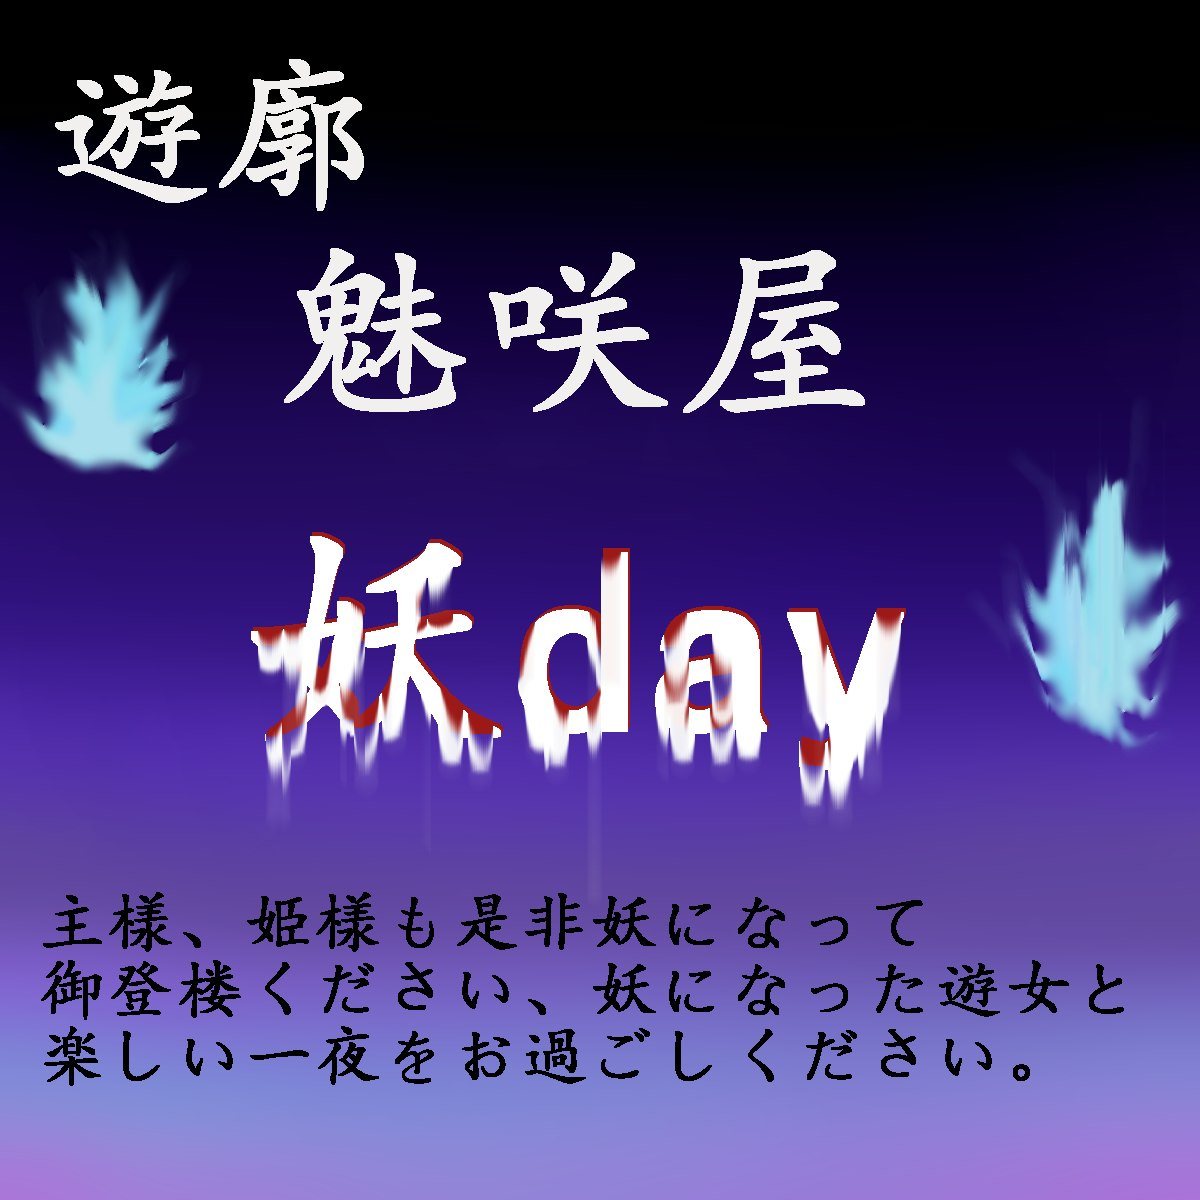 妖dayPOP